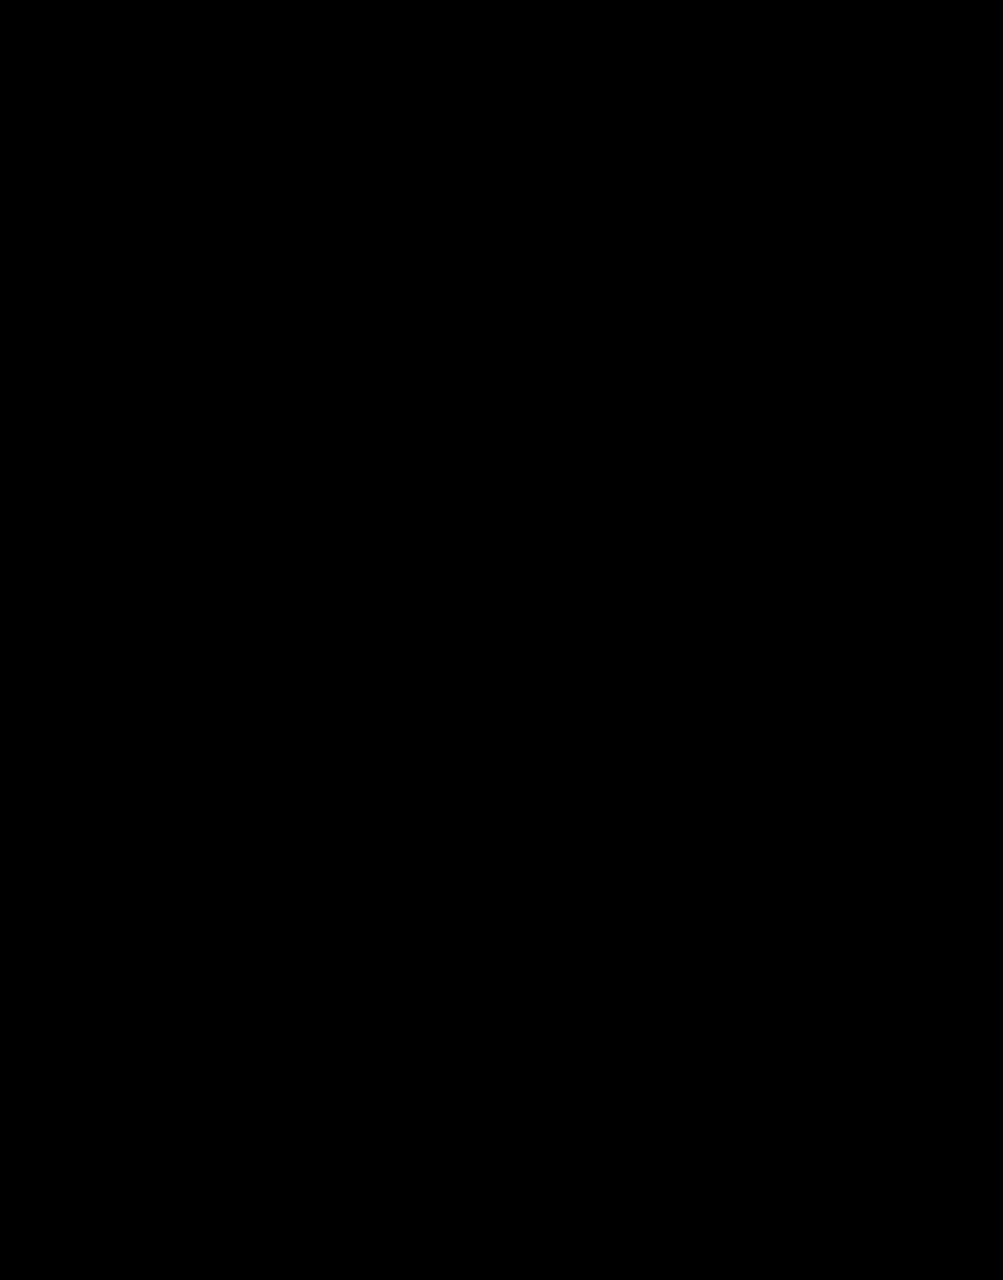 abraham-lincoln-5111304_1280